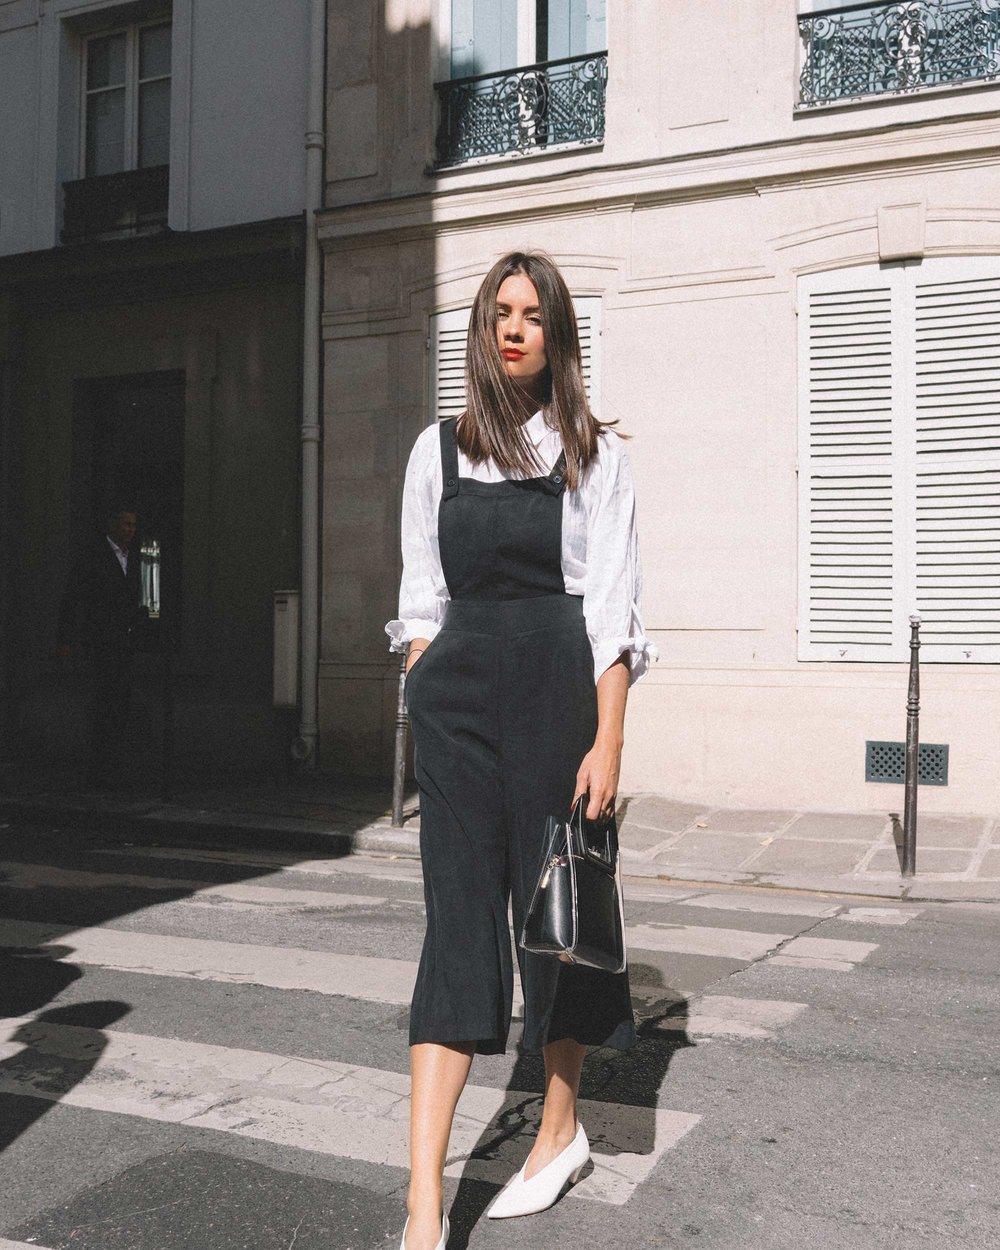 Black Culotte Overall Jumpsuit Paris Outfit4.jpg